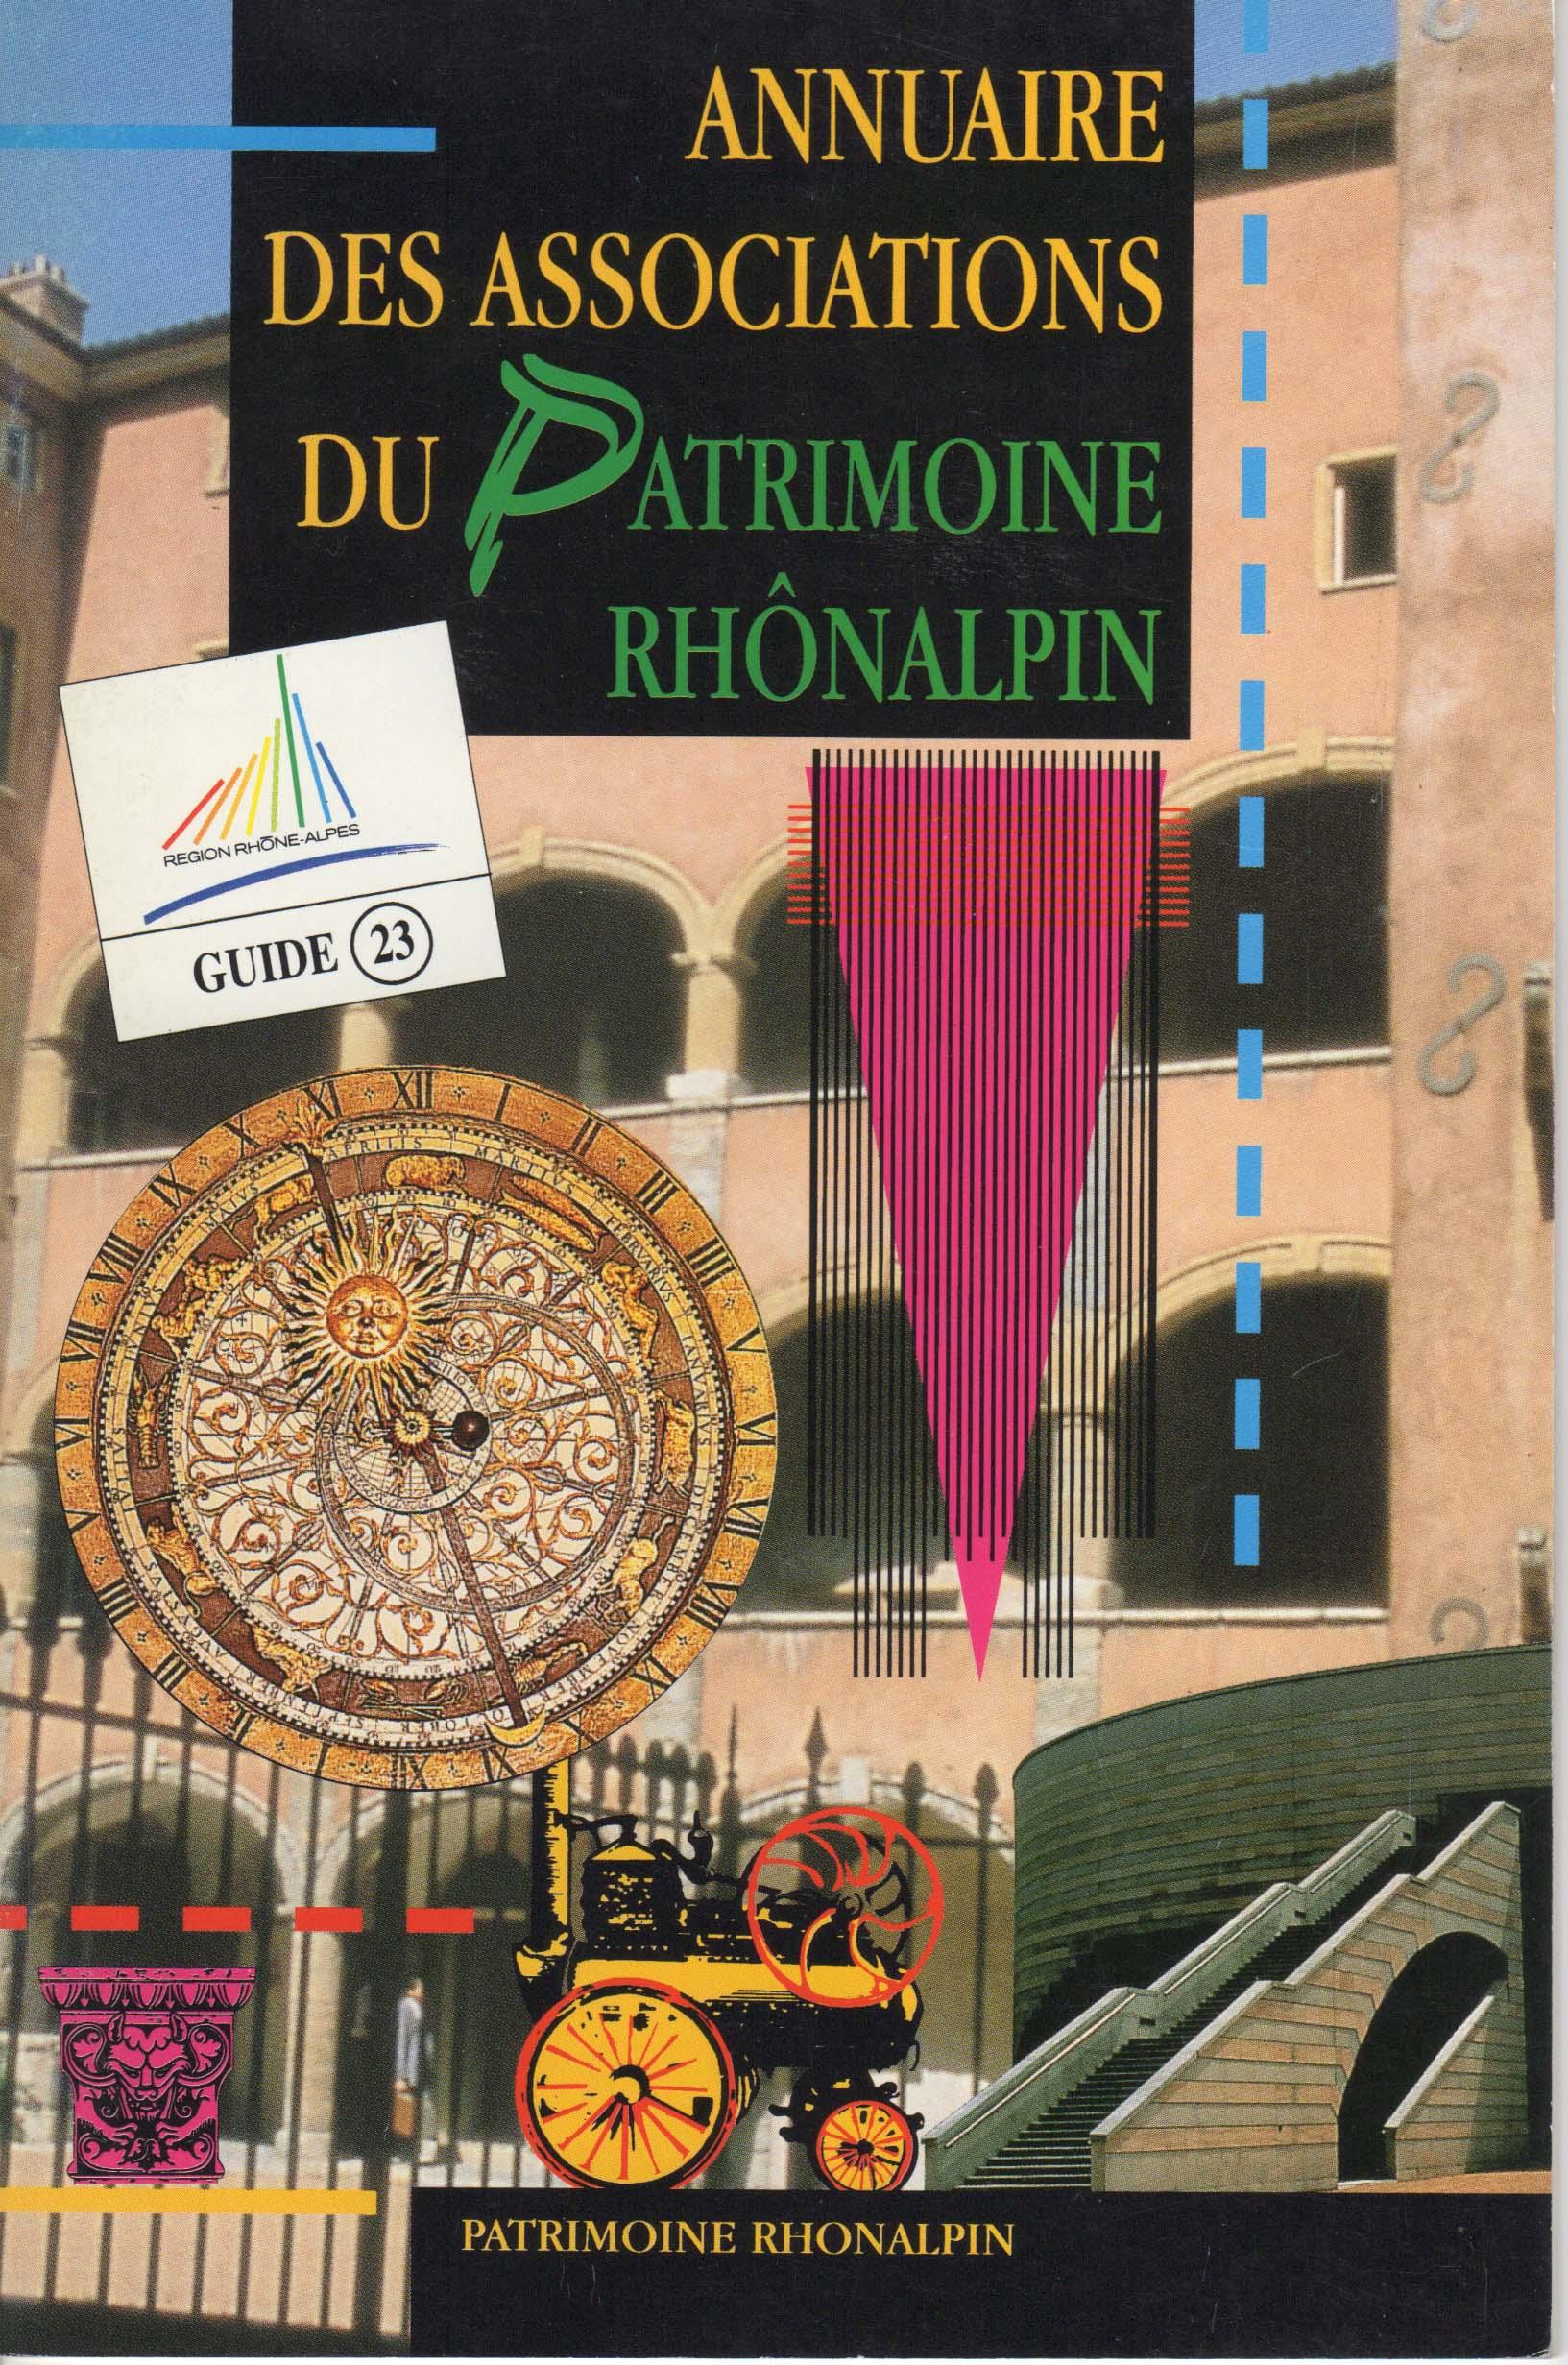 Guide n°23 – Annuaire des associations du Patrimoine Rhônalpin